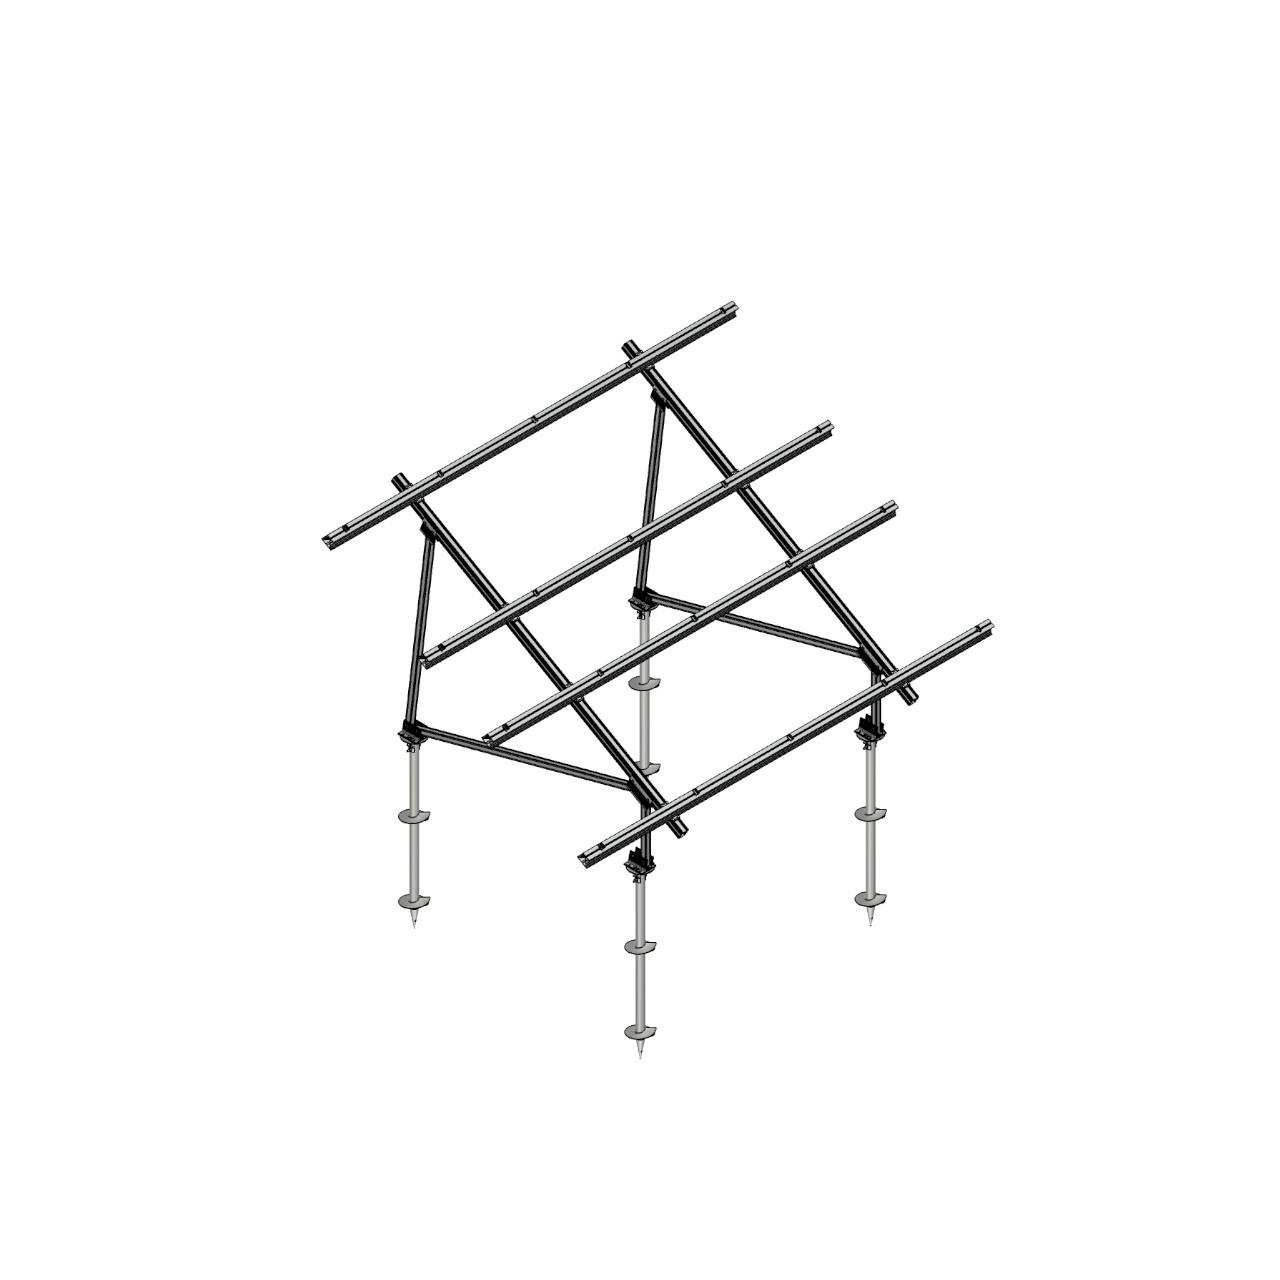 Schletter - PVMax 2Vx6-30deg-Screw-No-Panels